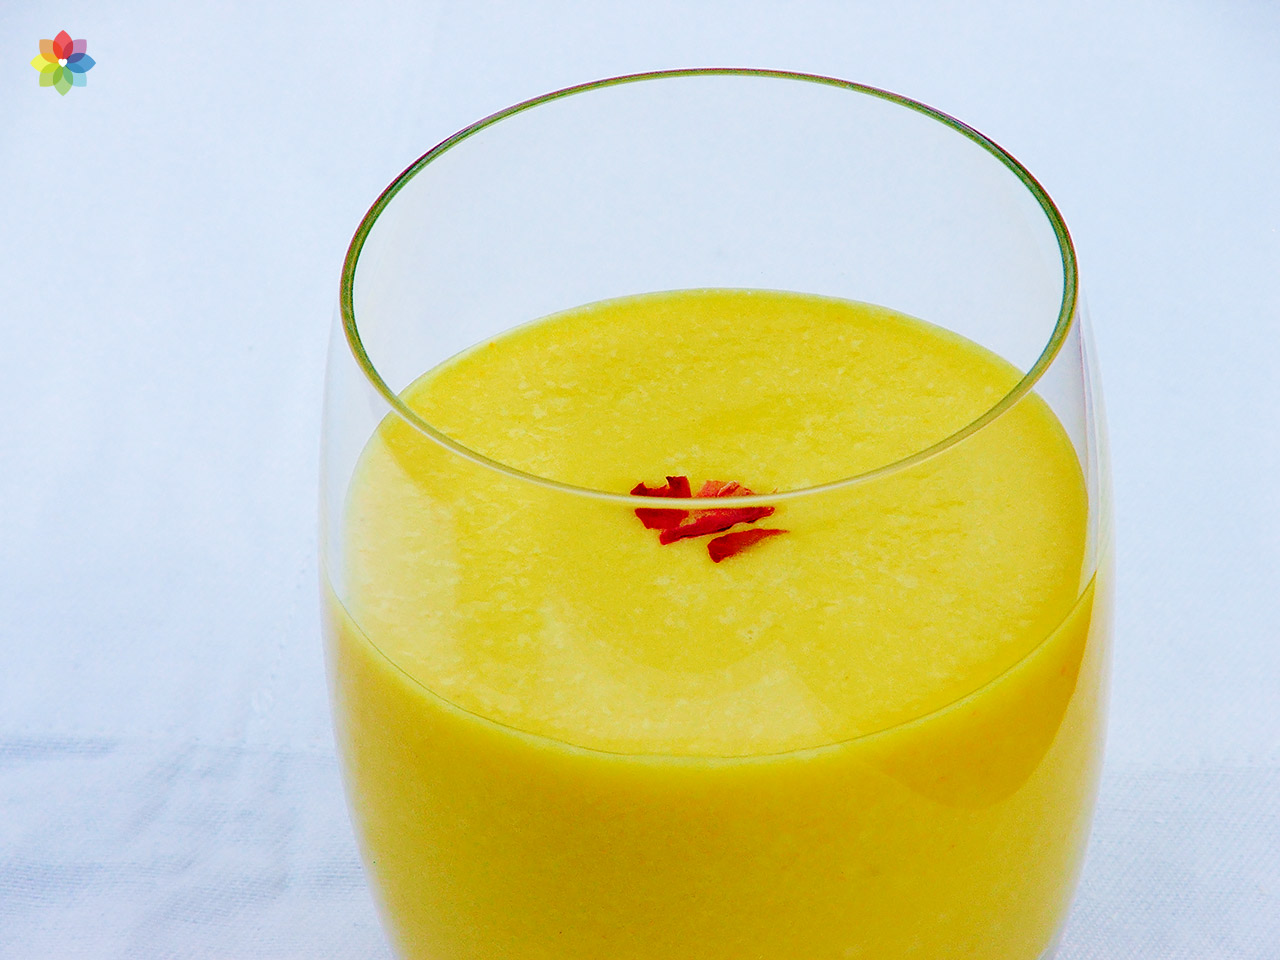 Vaso de vidrio con lassi de mango